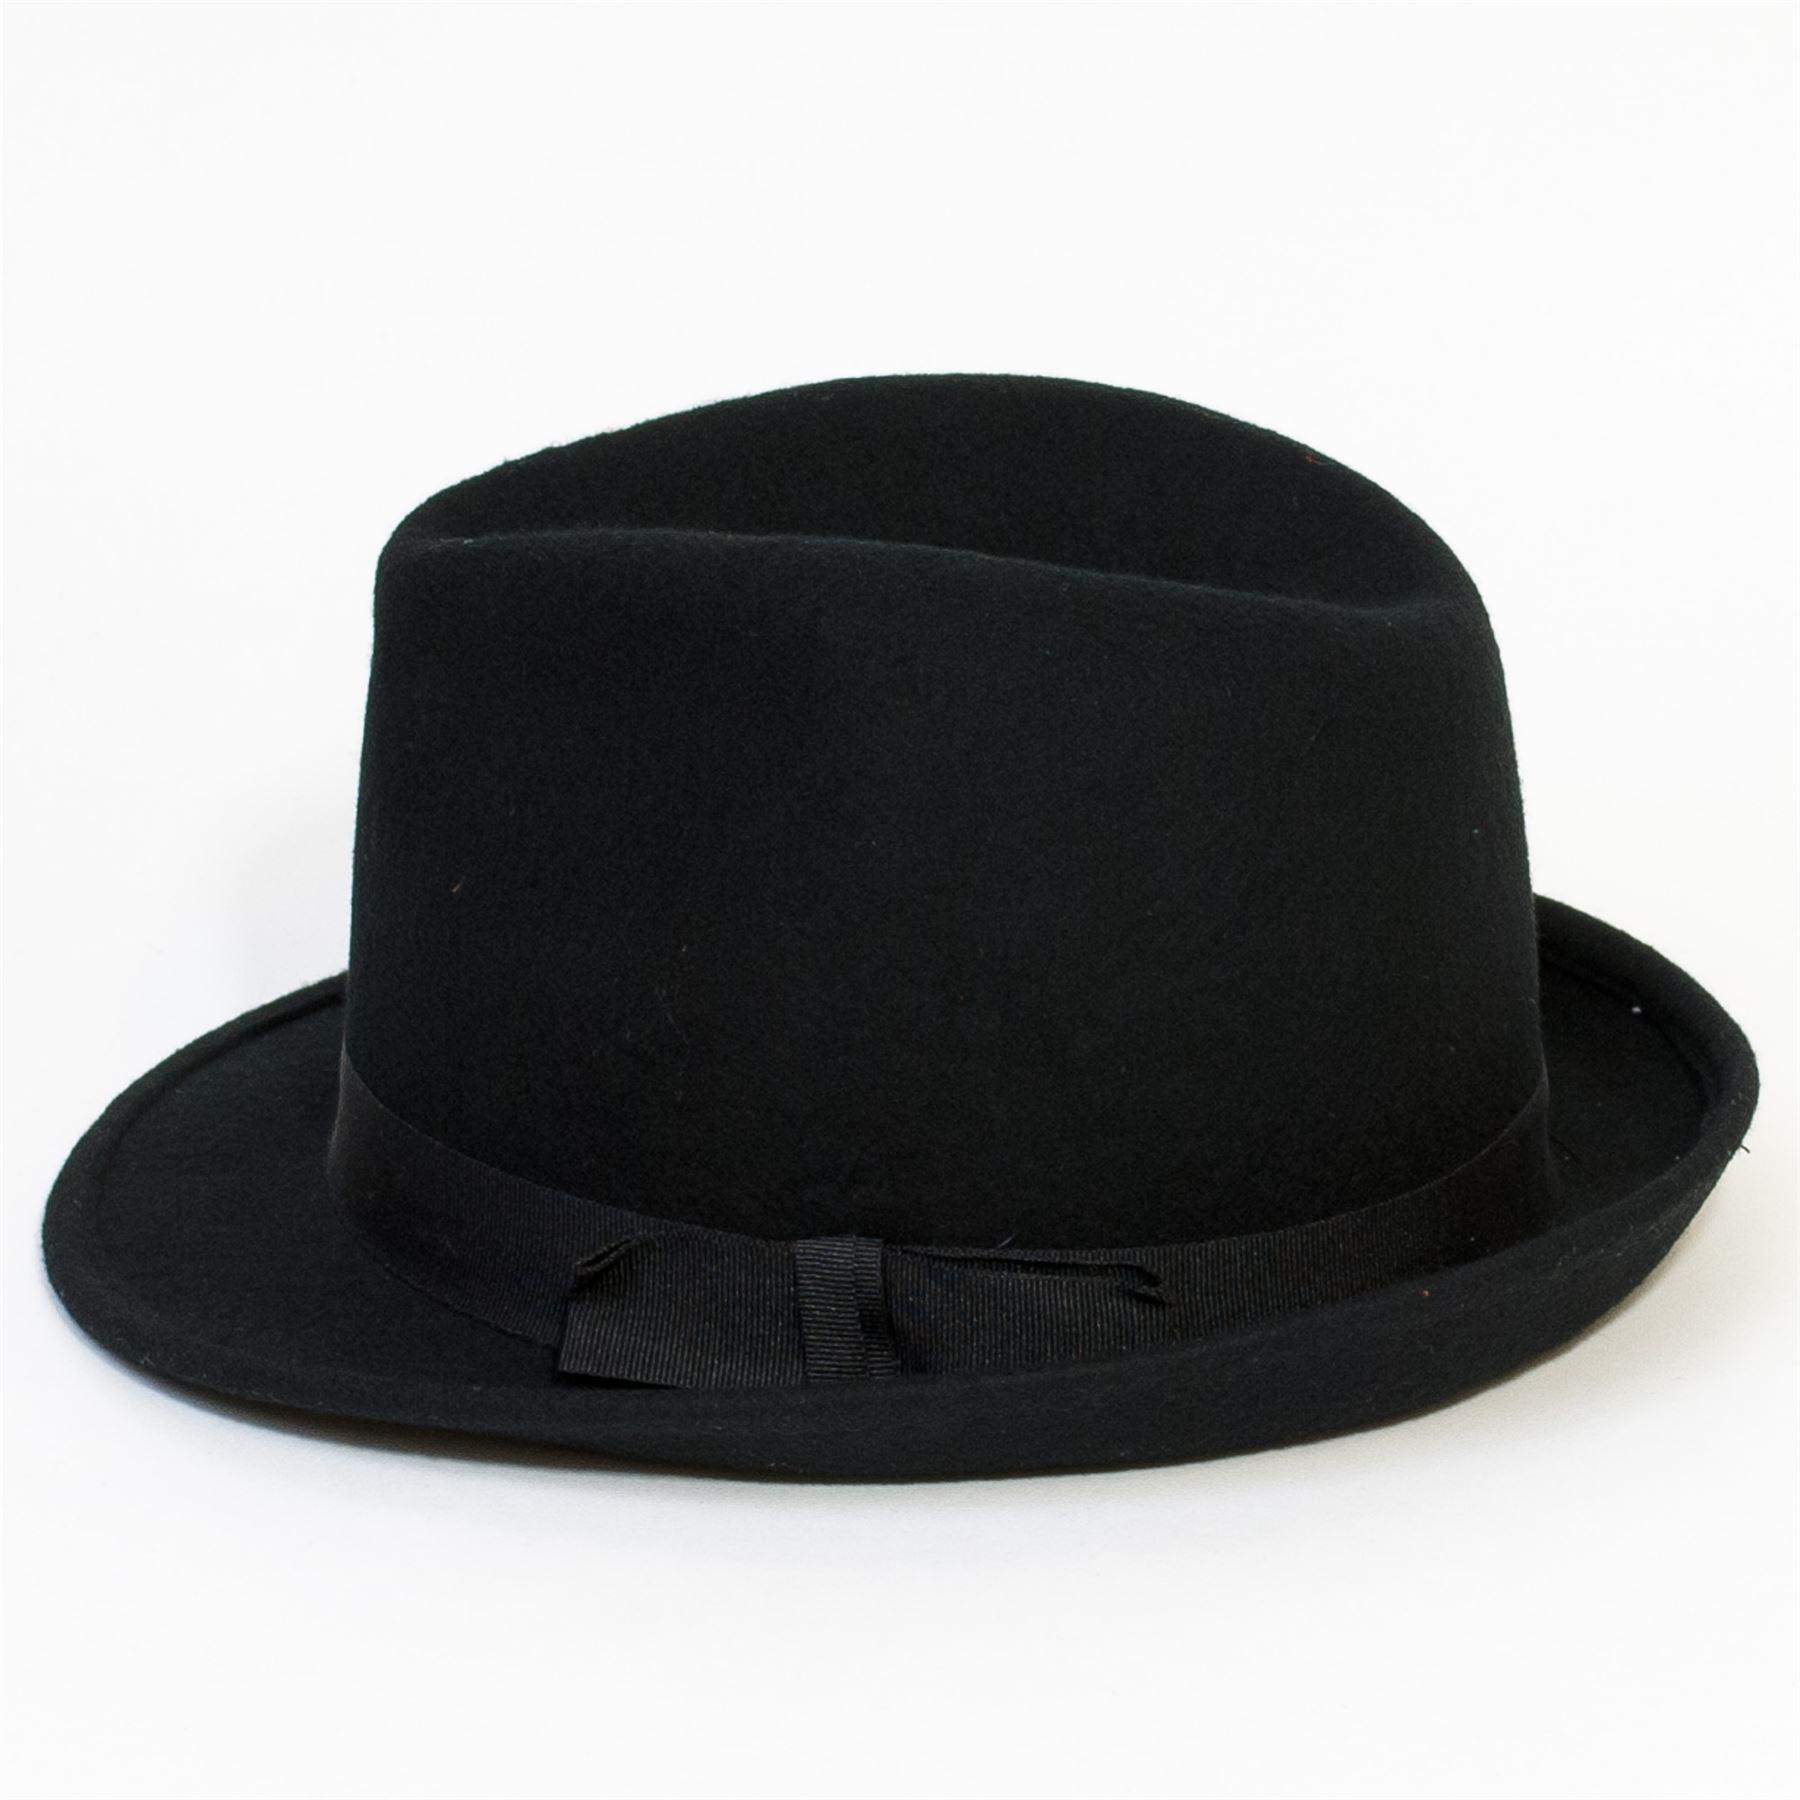 4b41ead718c Black-Felt-Trilby-Hat-with-Grosgrain-Ribbon thumbnail 11